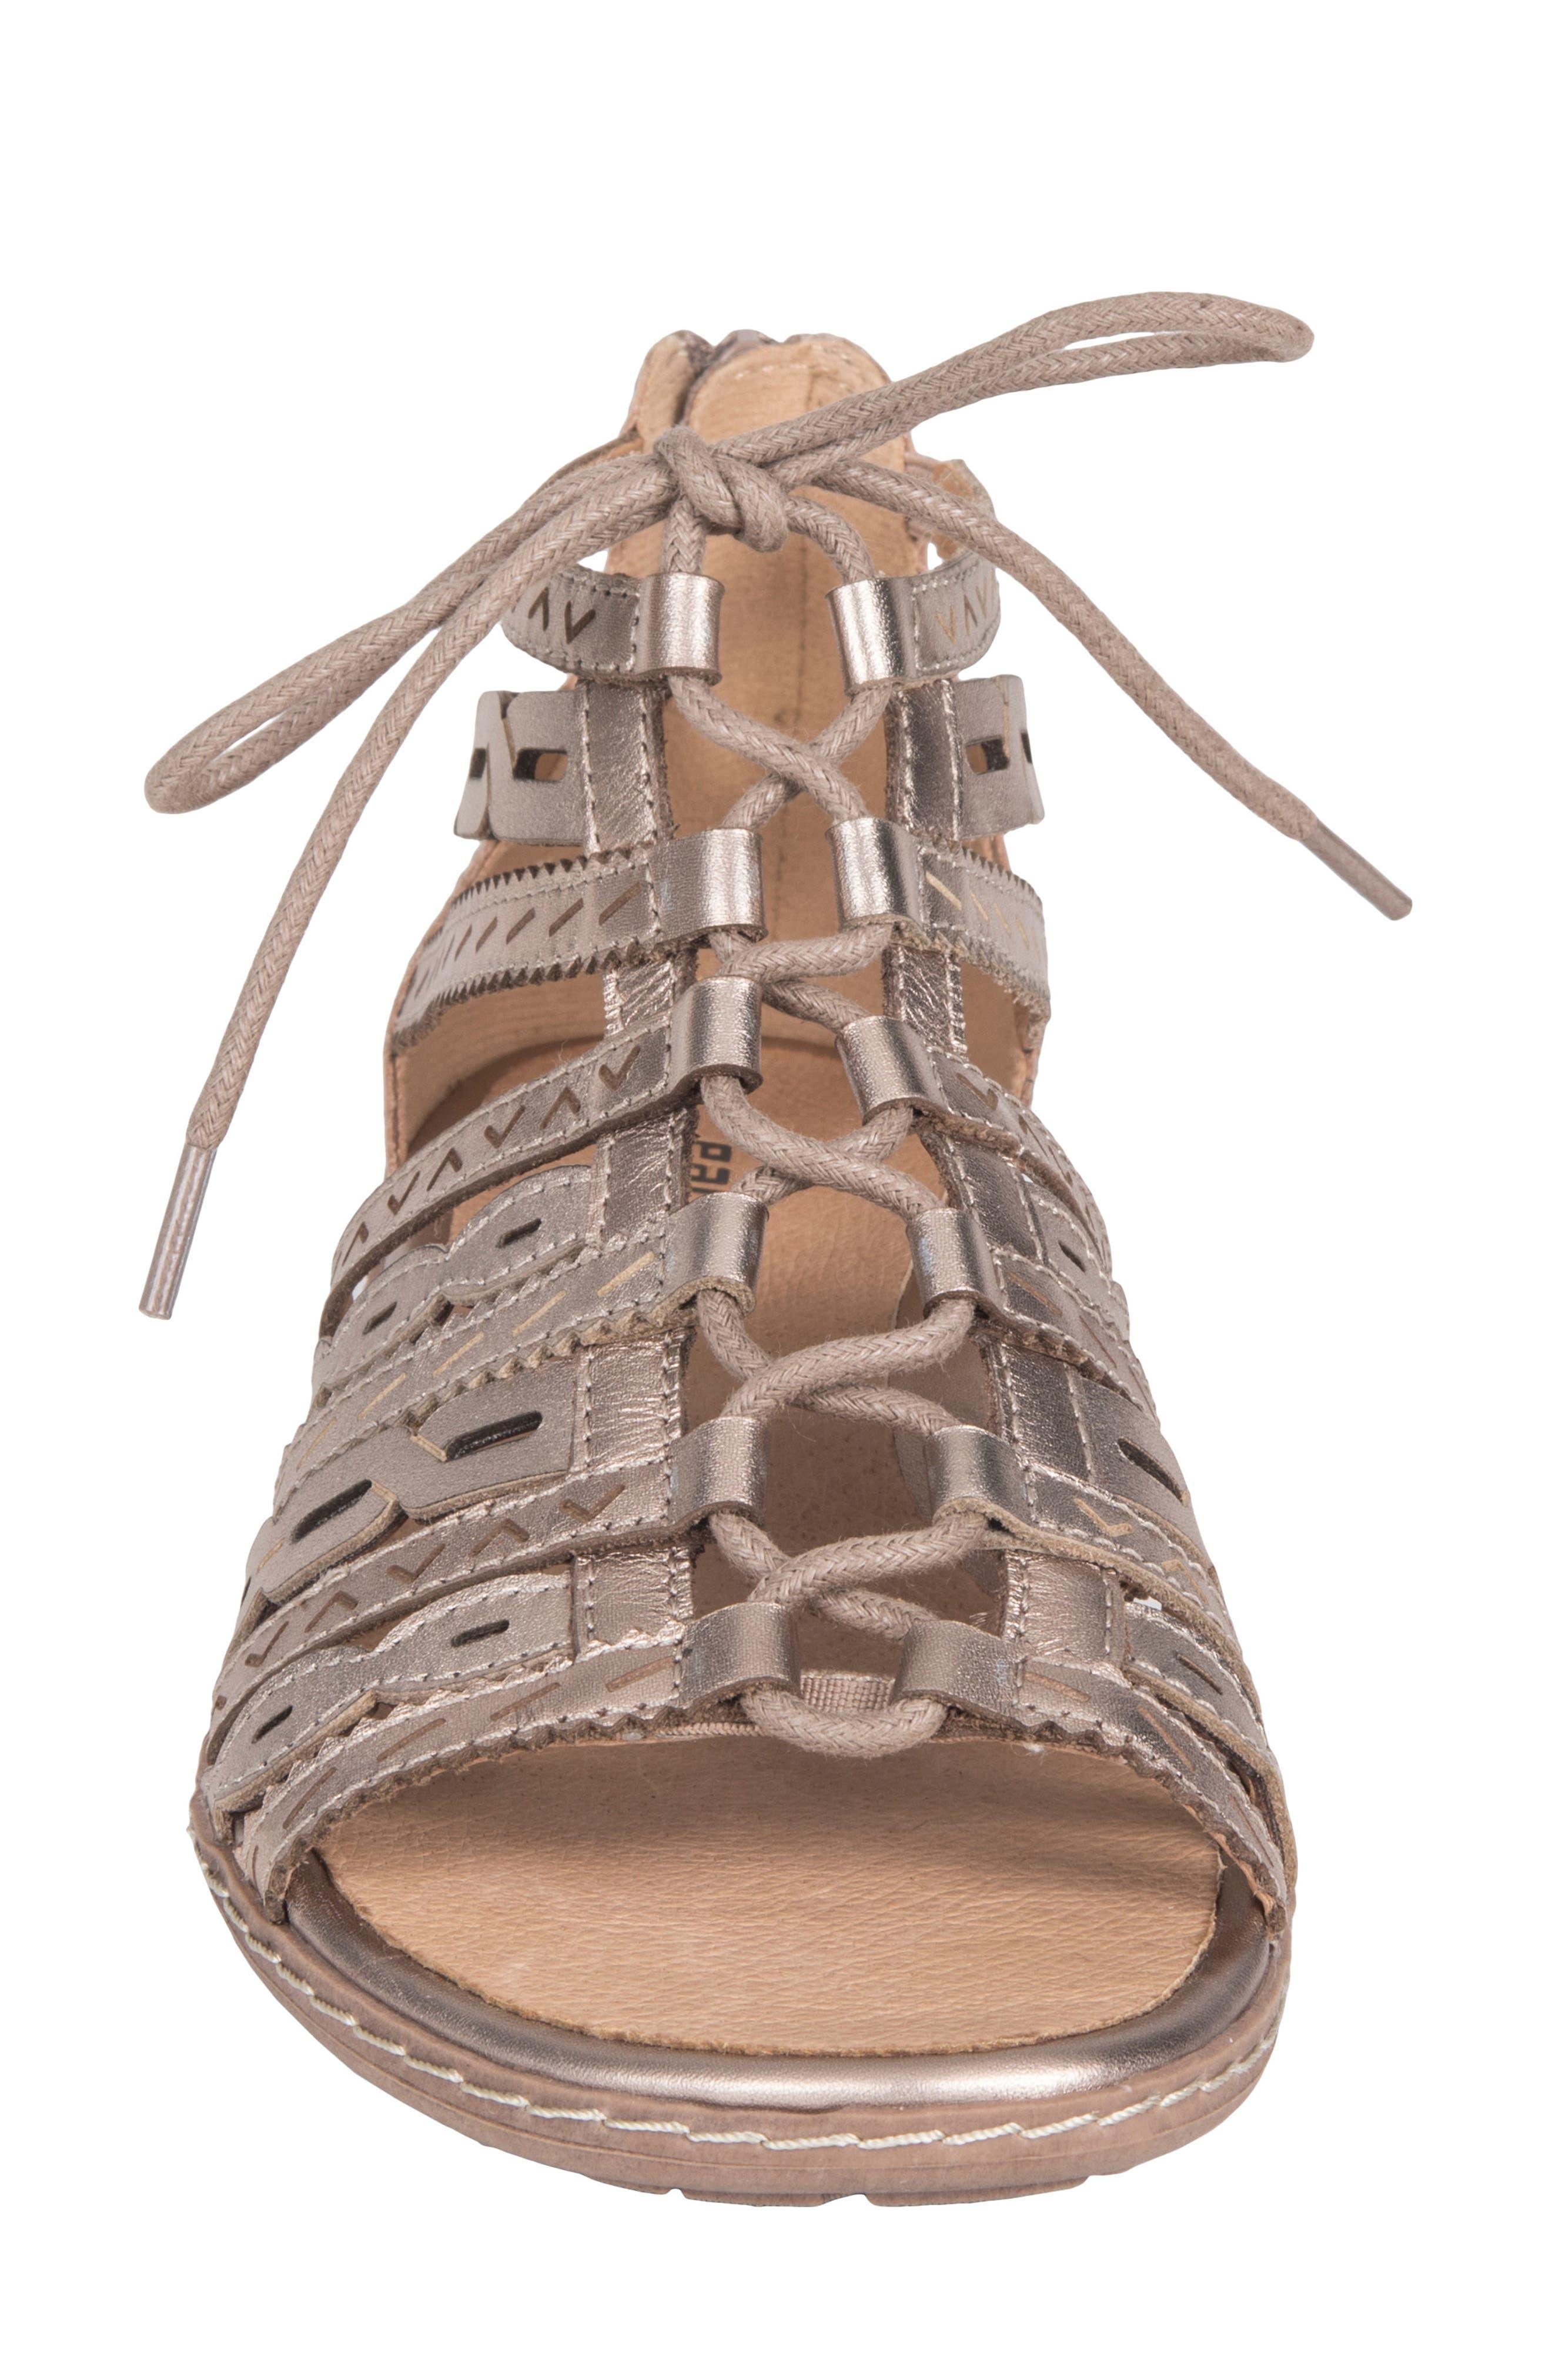 Tidal Mid Top Ghillie Sandal,                             Alternate thumbnail 4, color,                             Titanium Leather